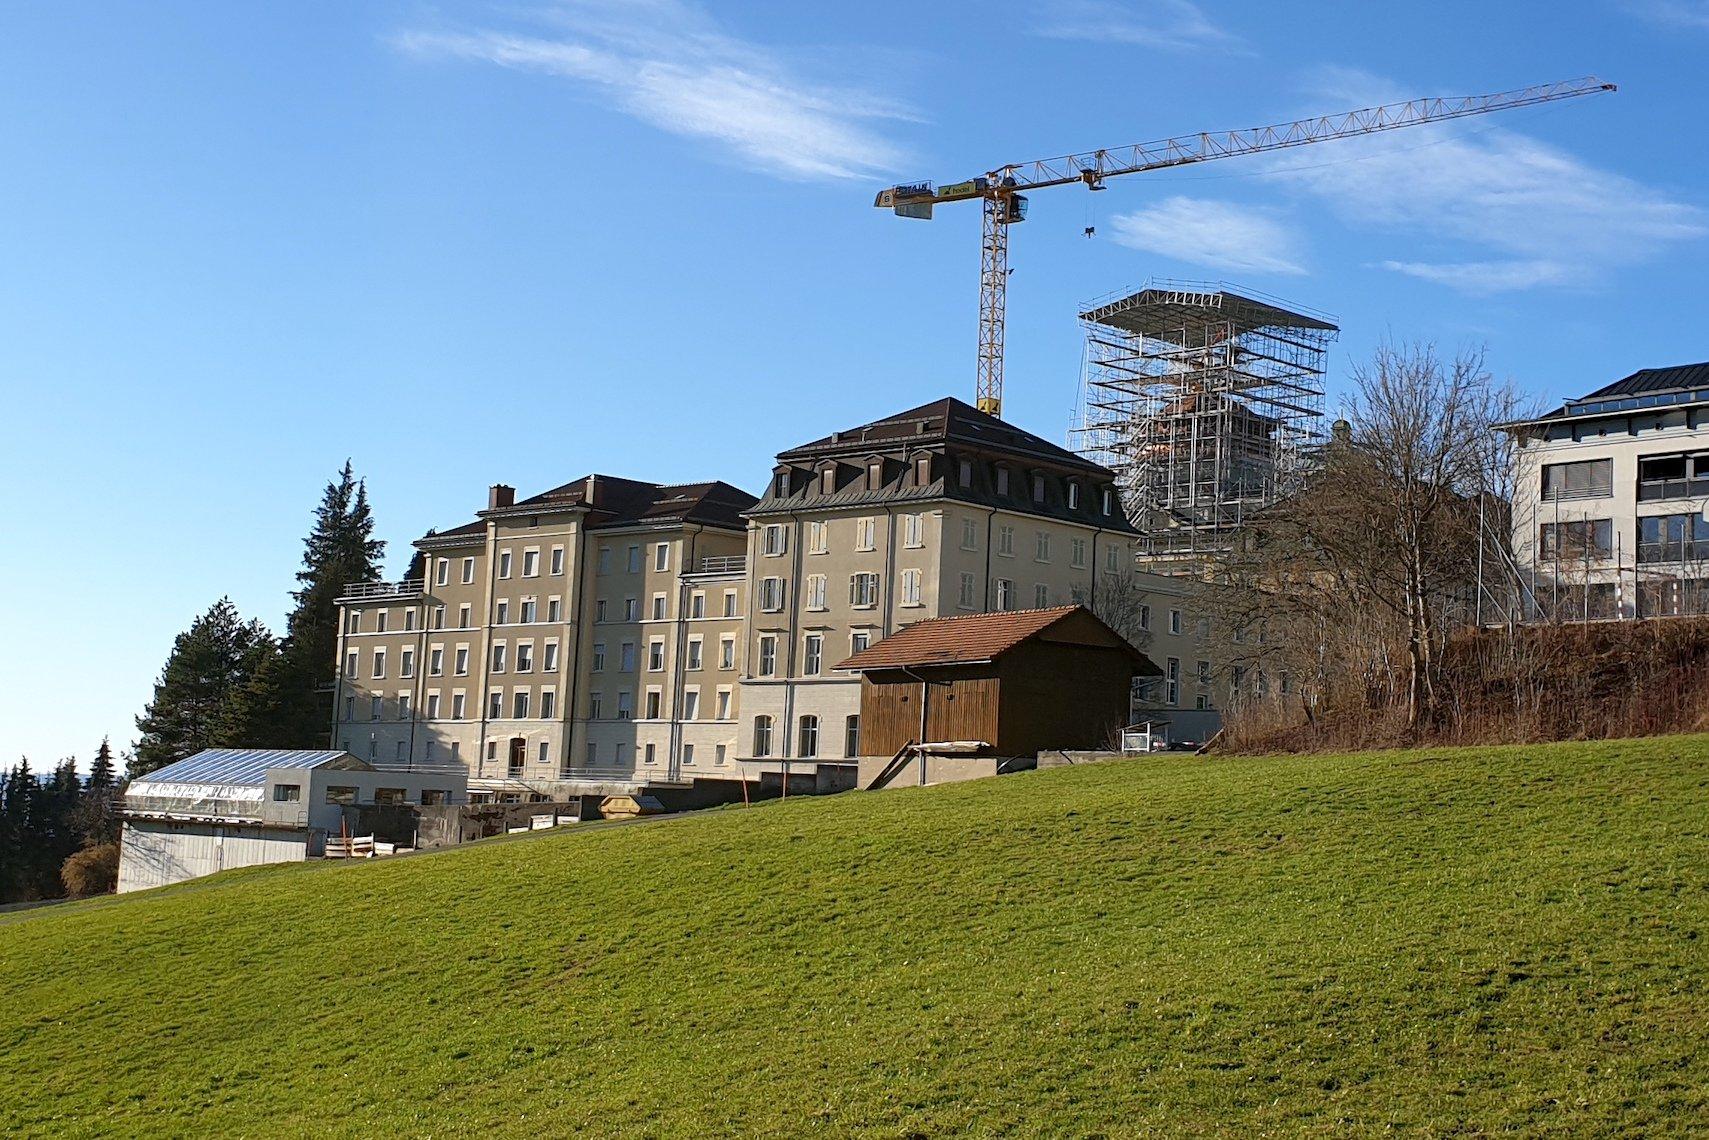 Südflügel des Klosters Menzingen.